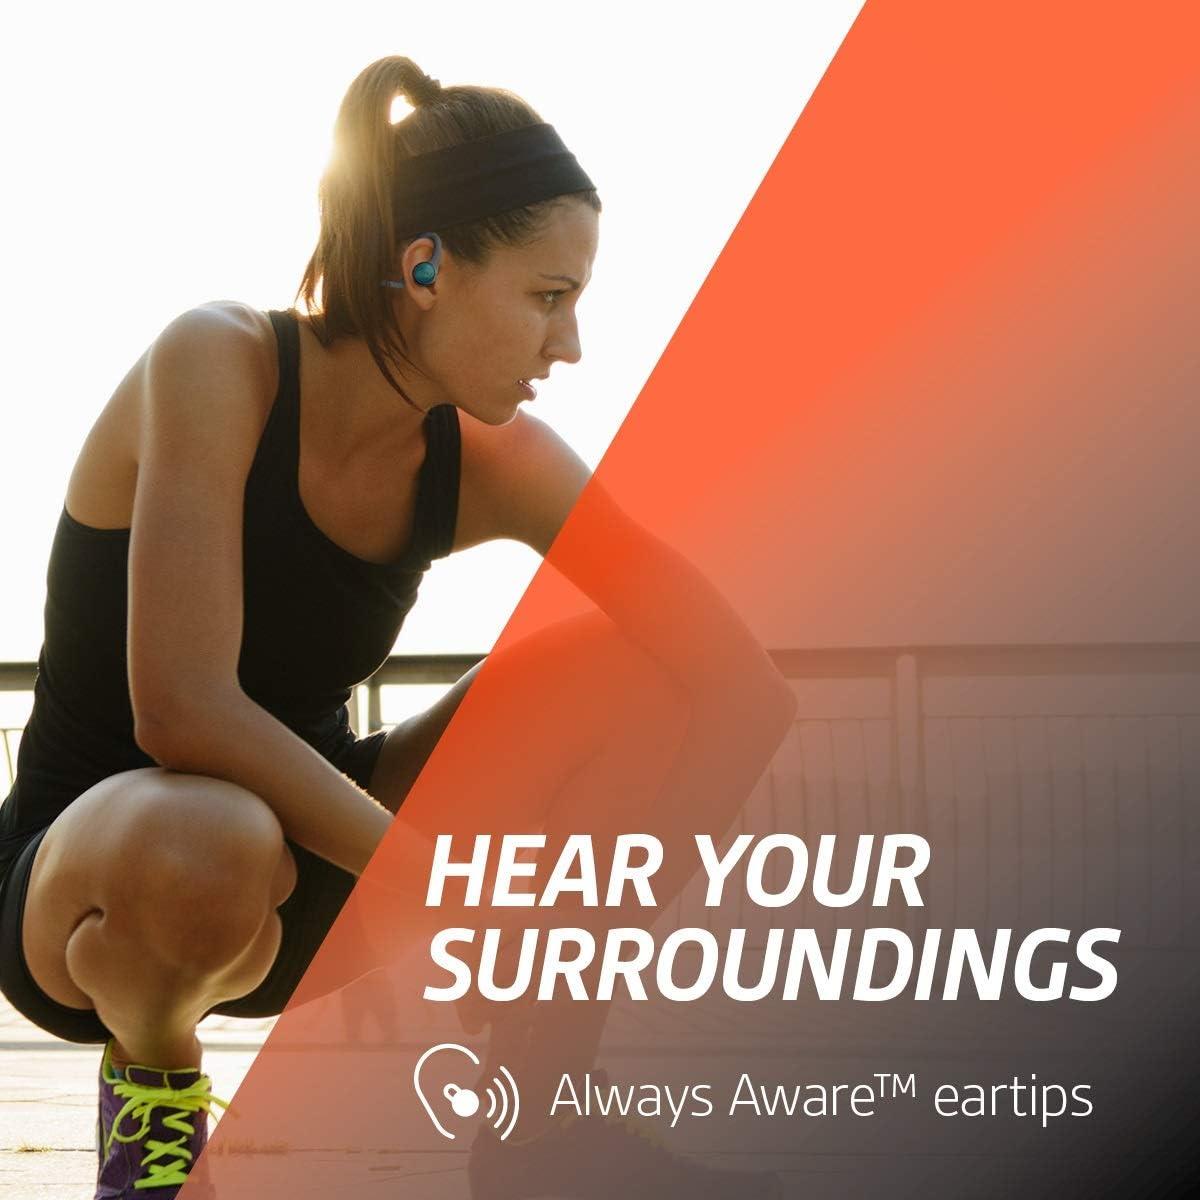 Plantronics BackBeat FIT 2100 Wireless Headphones, Sweatproof and Waterproof In Ear Workout Headphones, Black